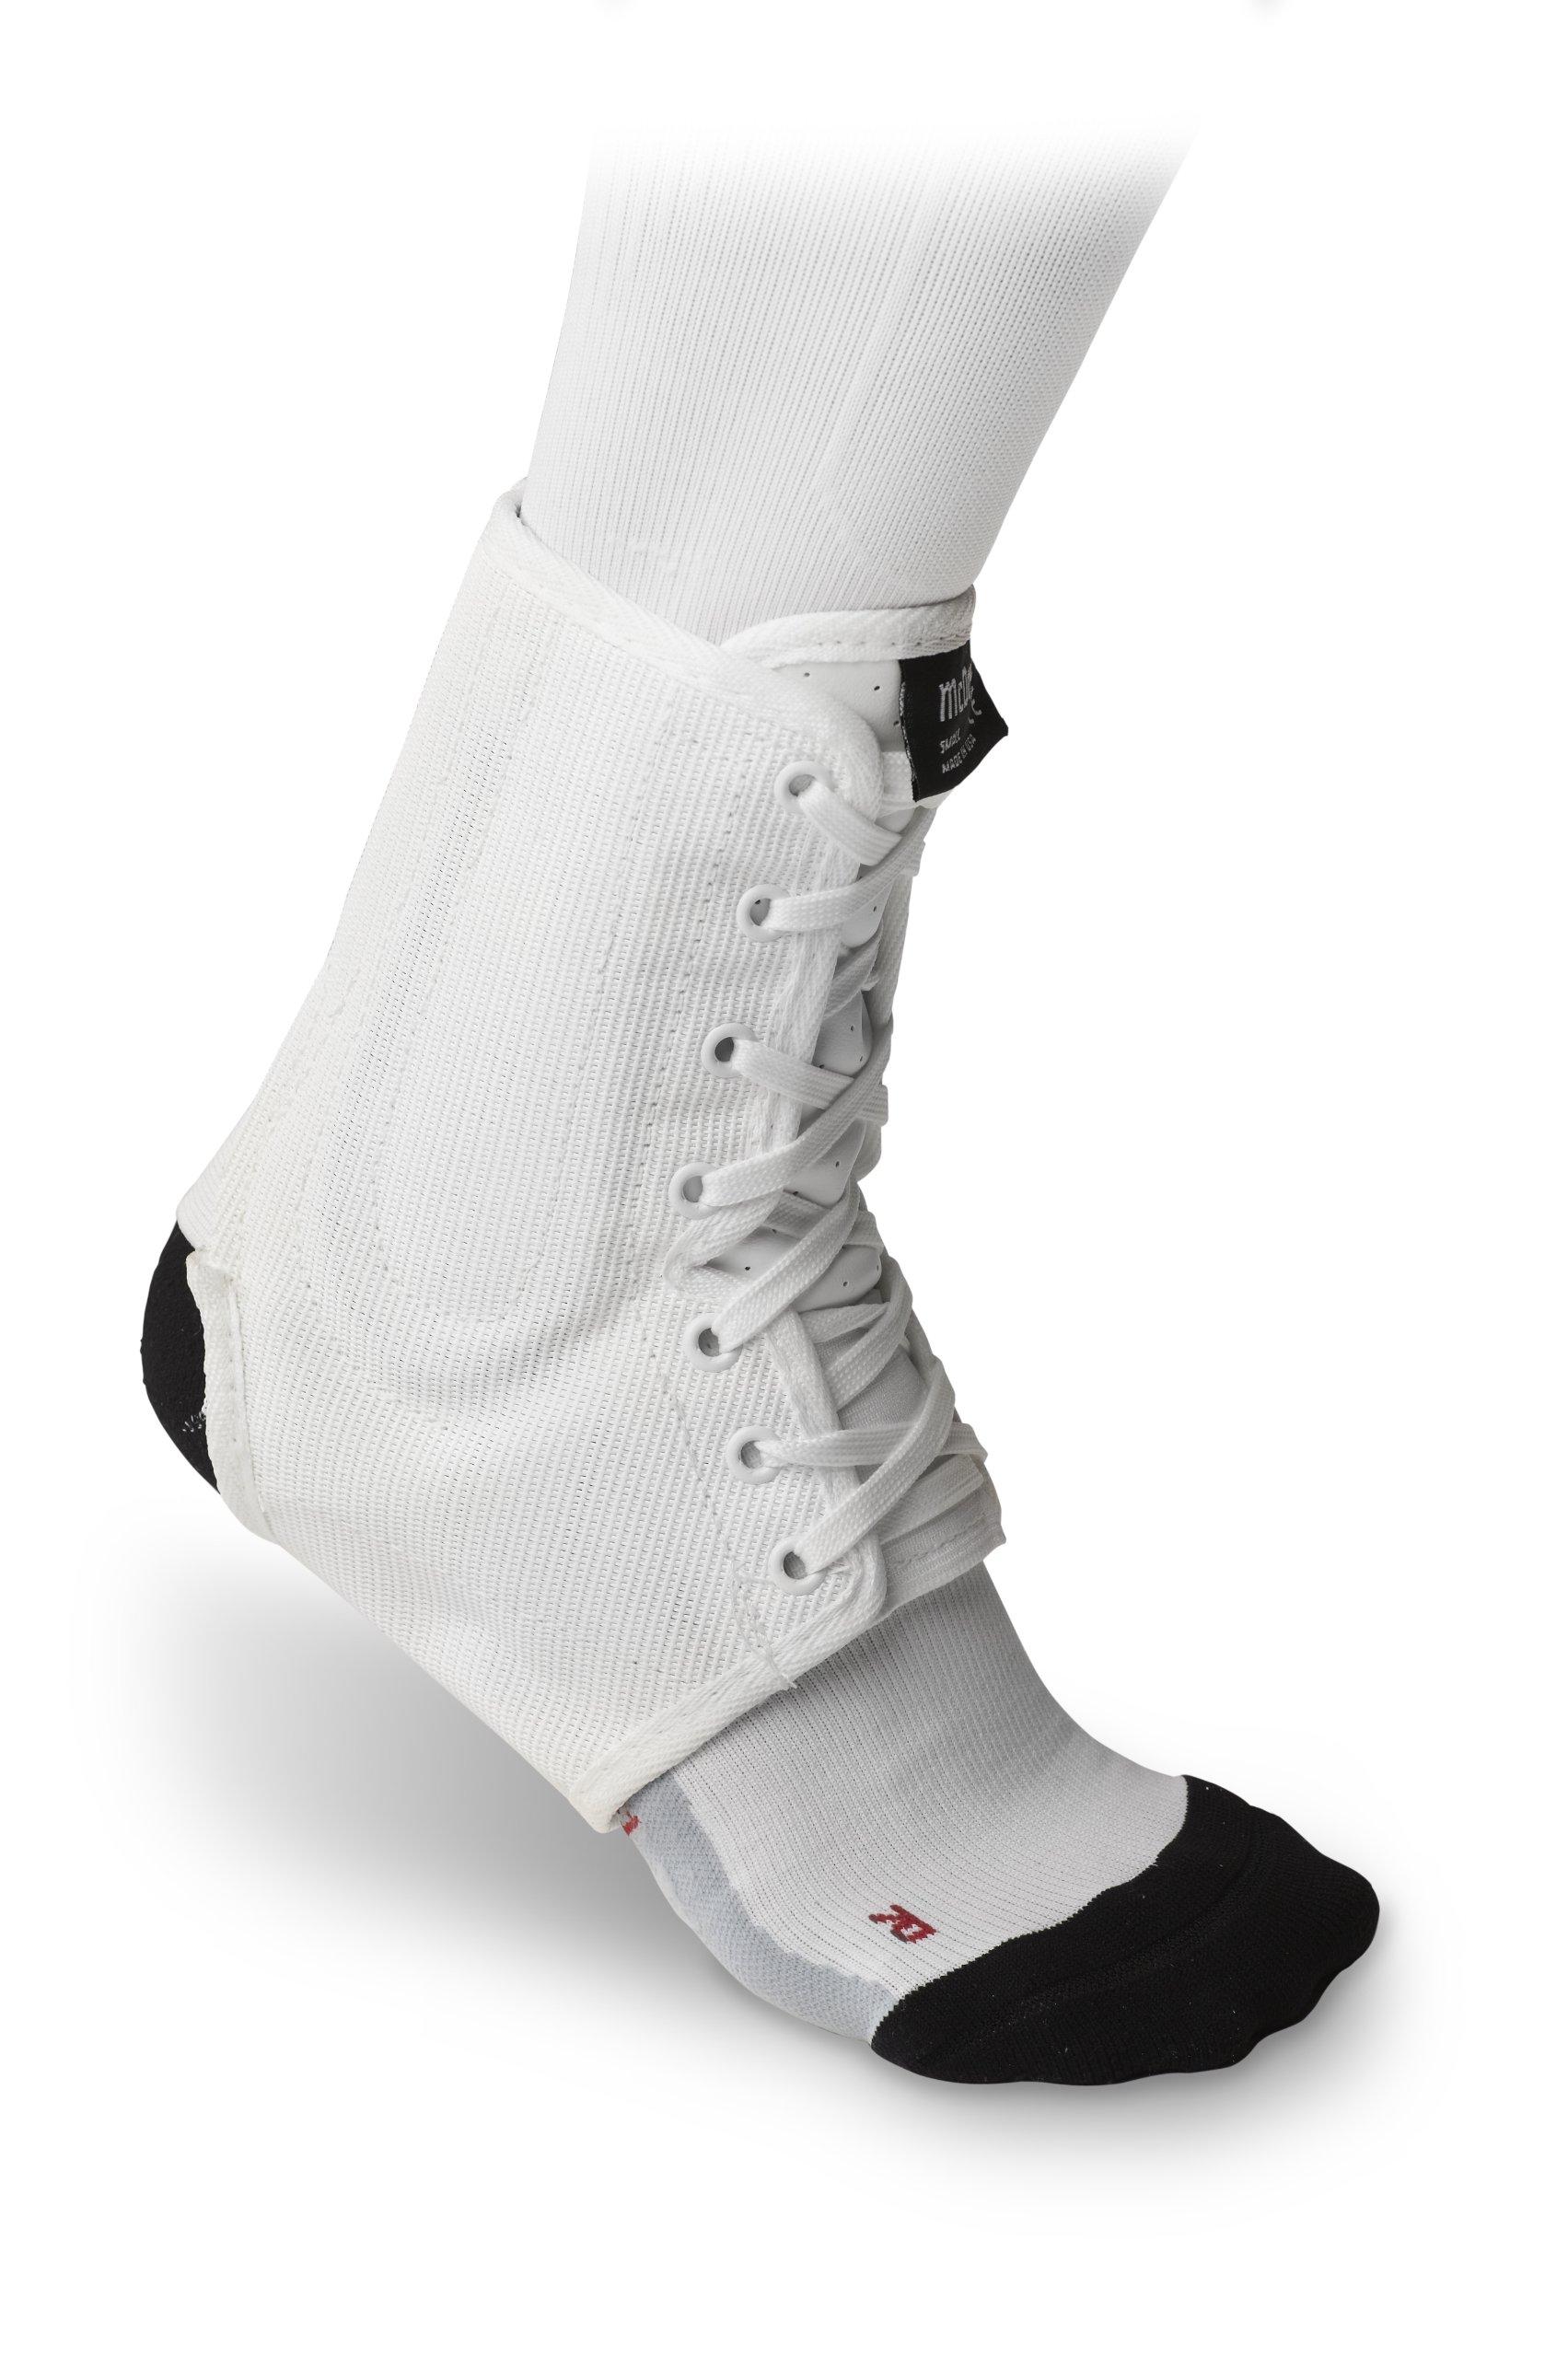 McDavid Classic Lightweight Ankle Brace (White, X-Large)